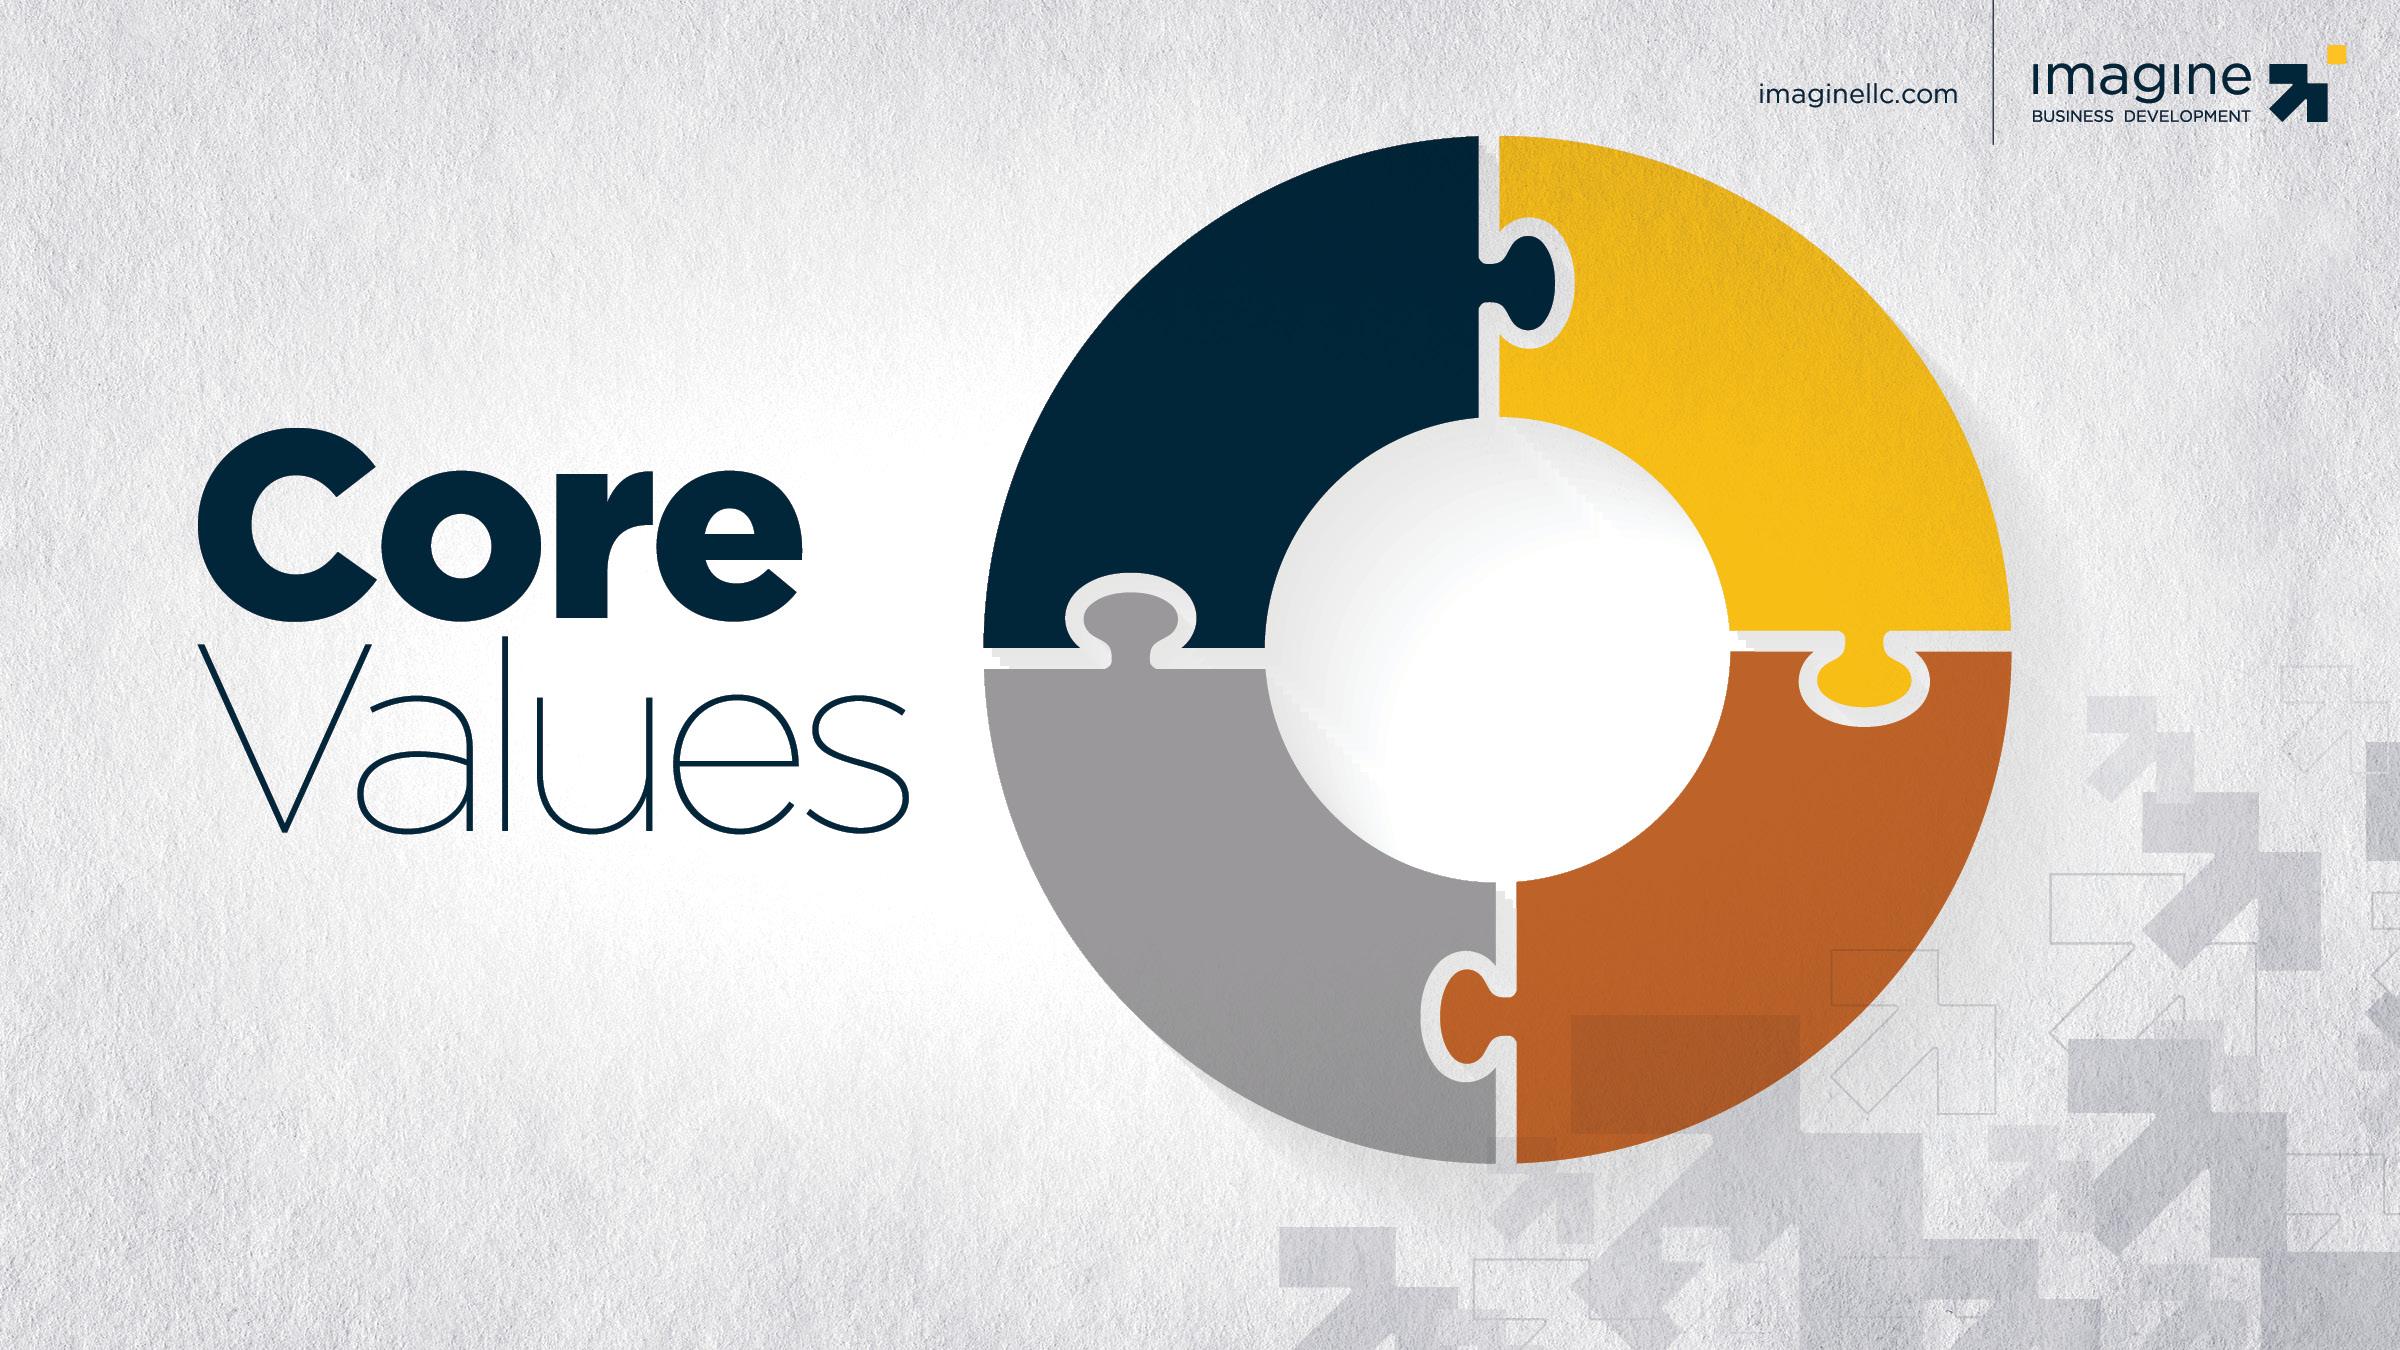 imagine-core-values.jpg